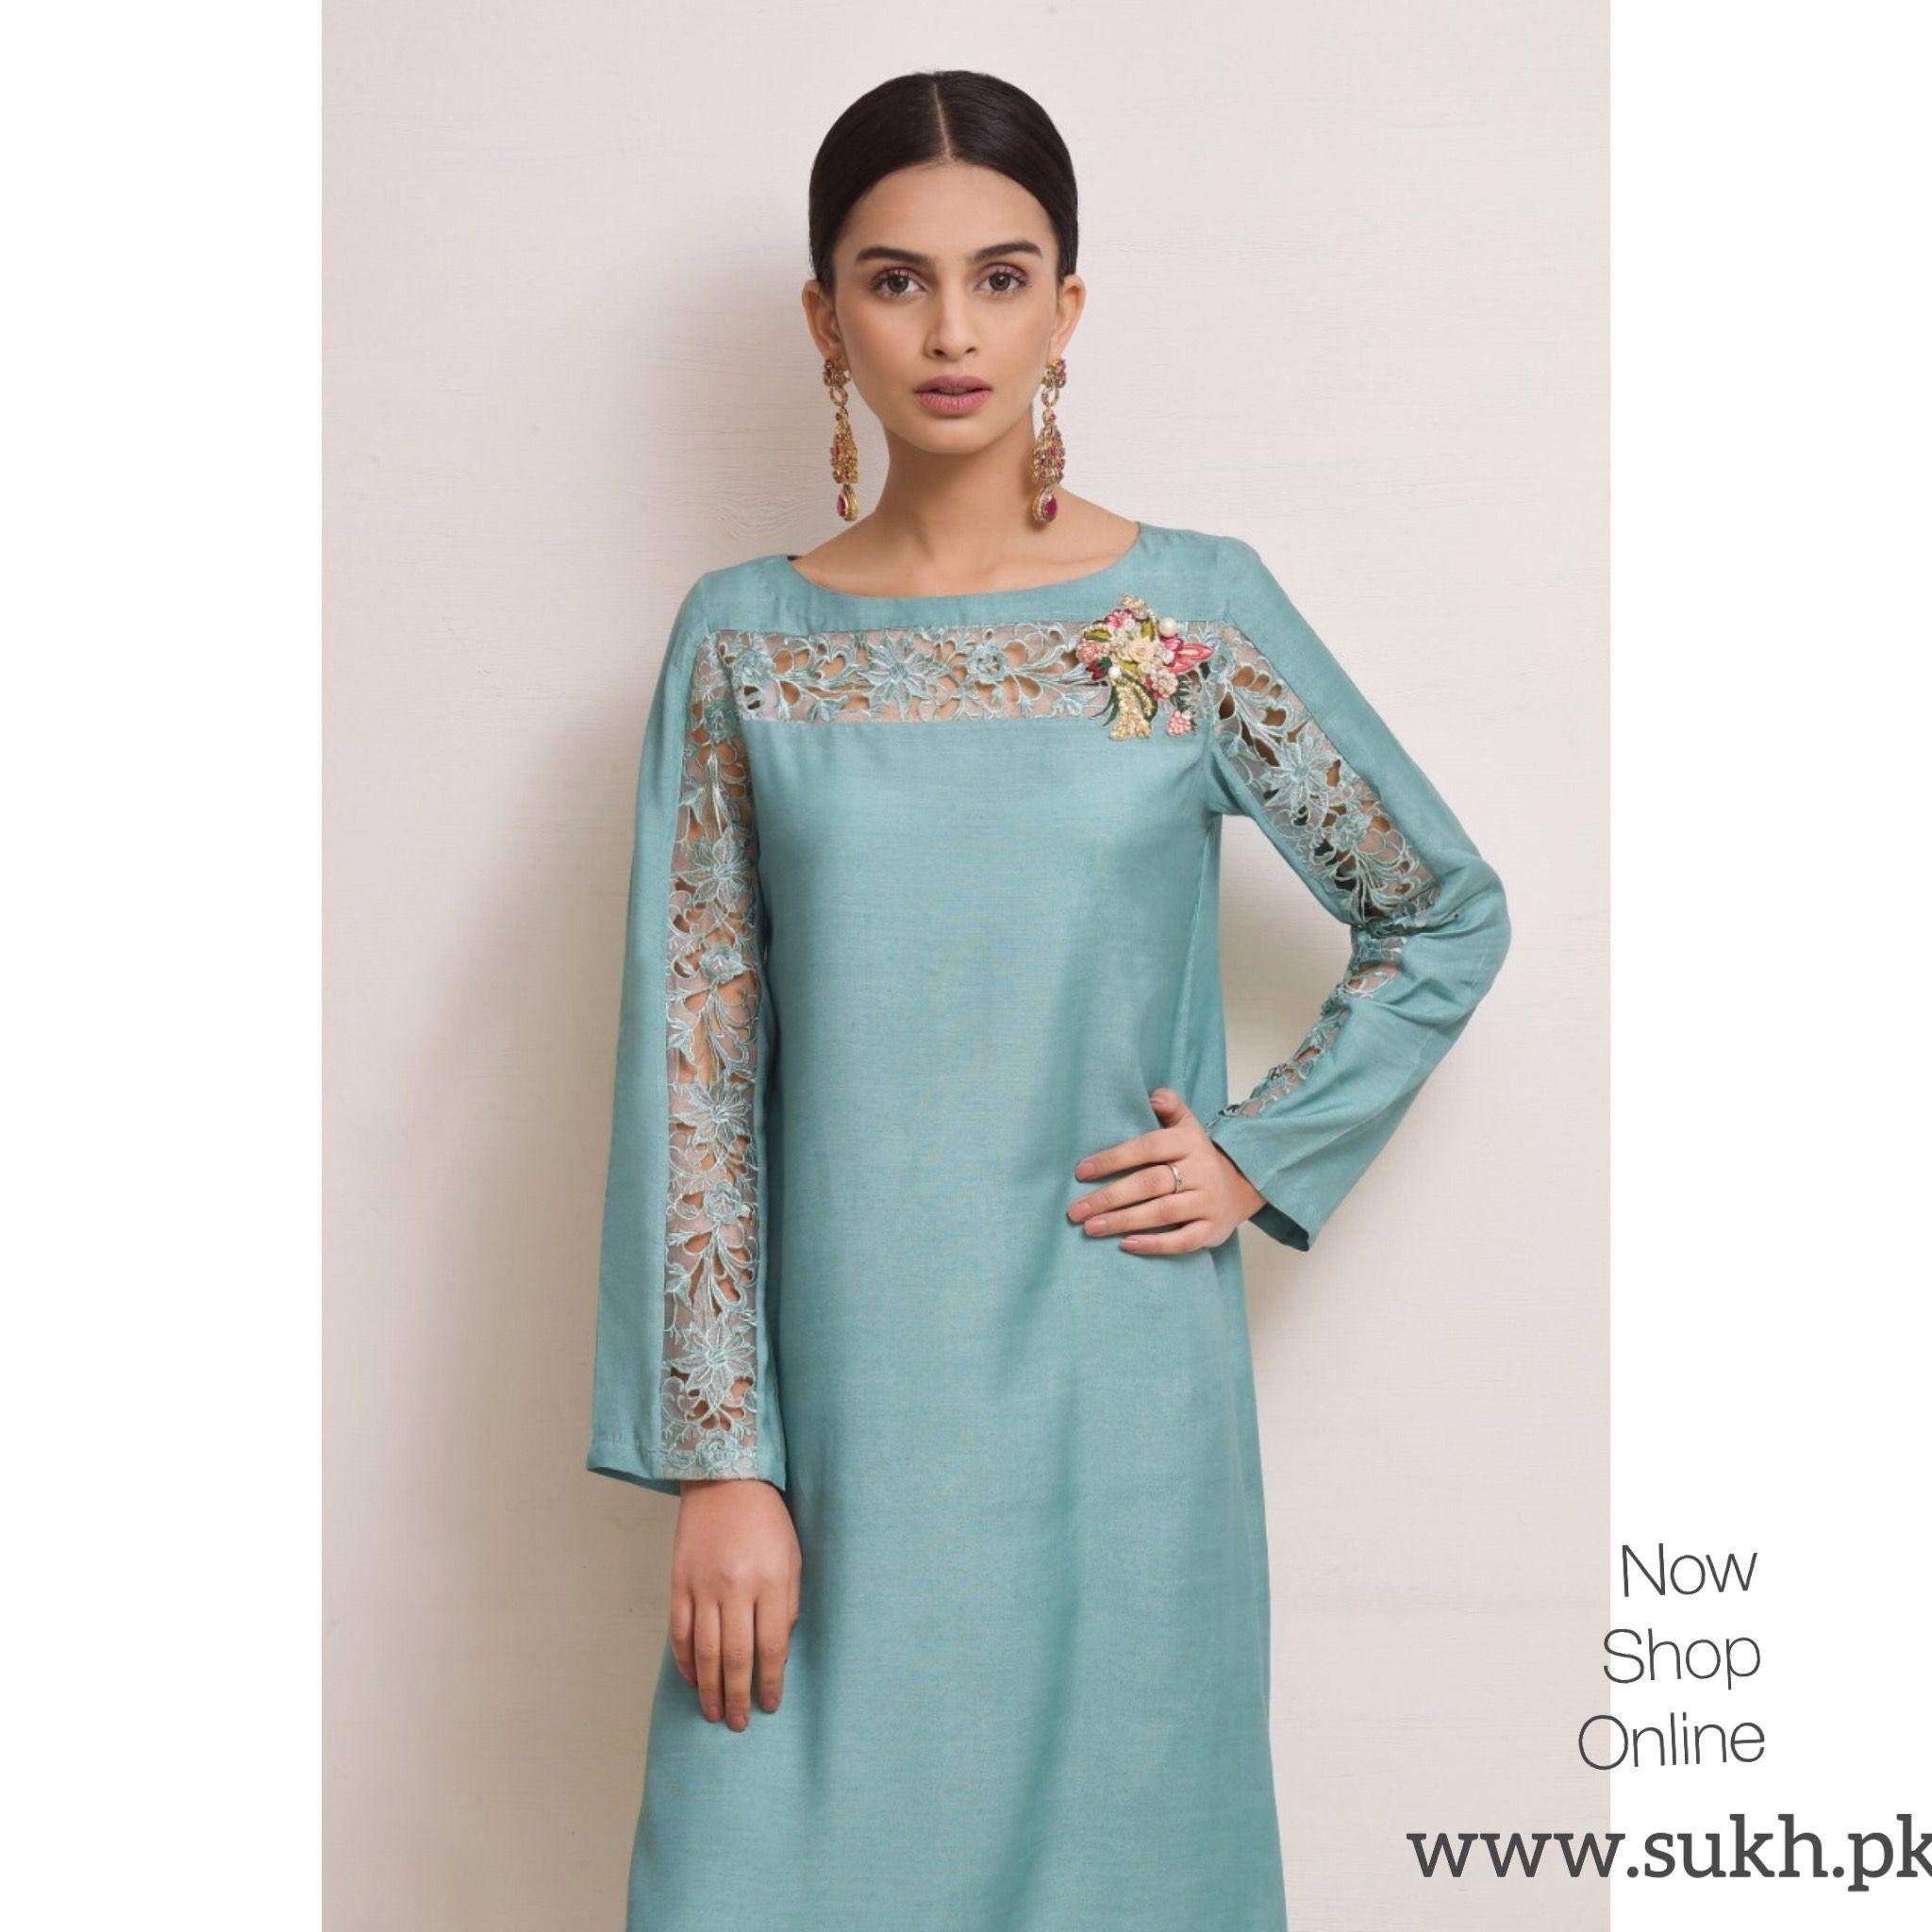 Dress Neck Designs, Ladies Mini Dresses